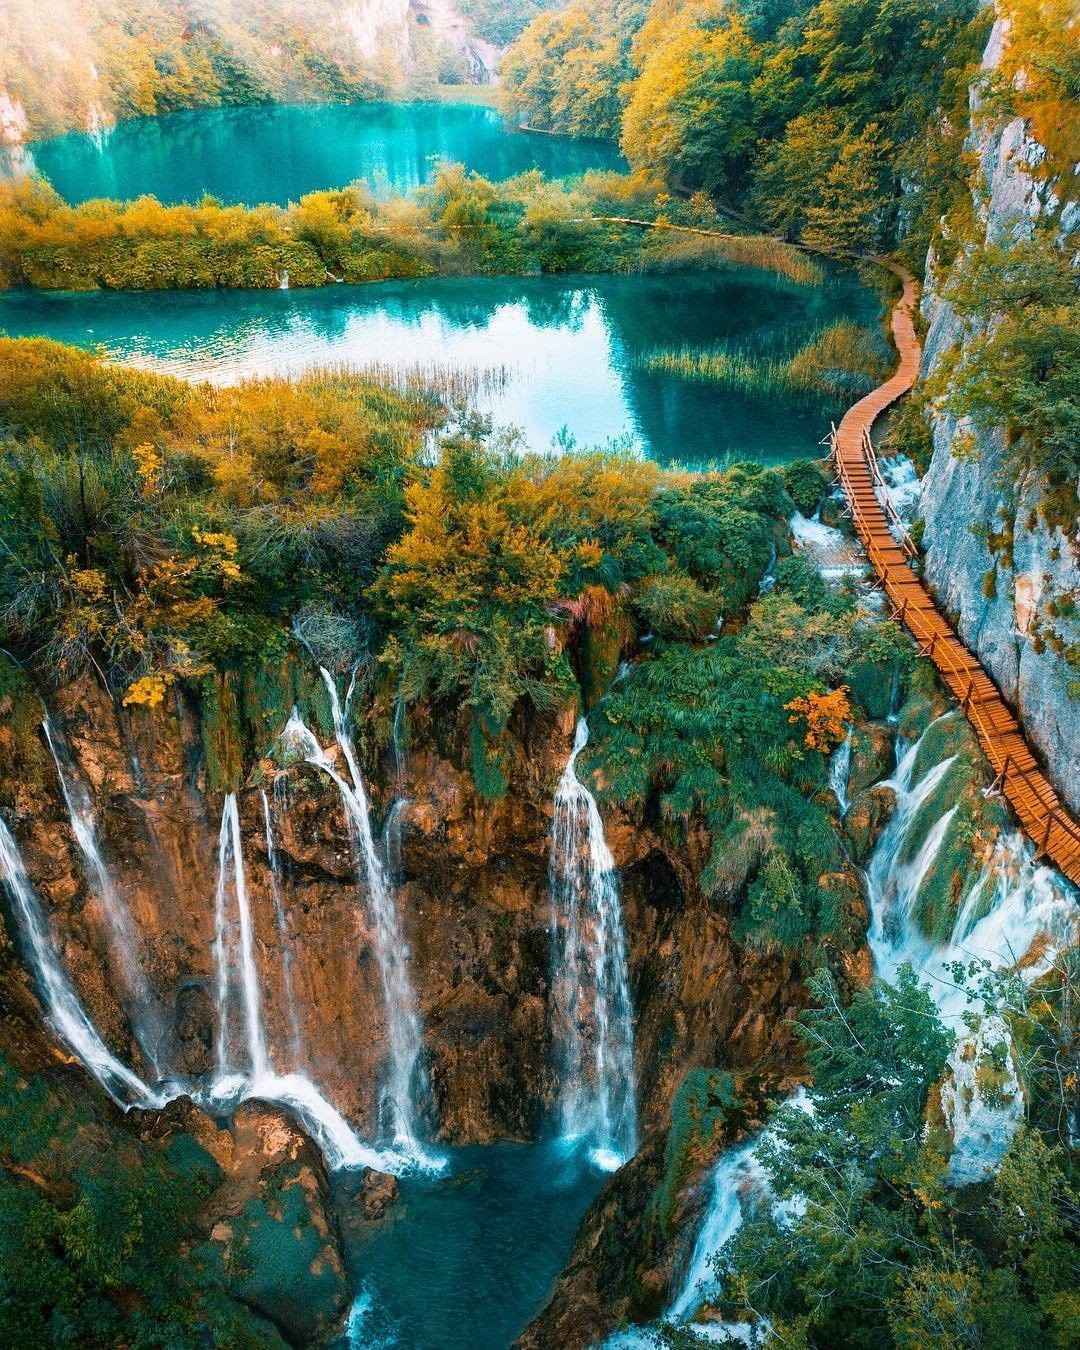 Plitvice, Croatia - Monterrasol private tours to Plitvice, Croatia. Travel agency offers custom private car tours to see Plitvice in Croatia. Order custom private tour to Plitvice with departure date on request.